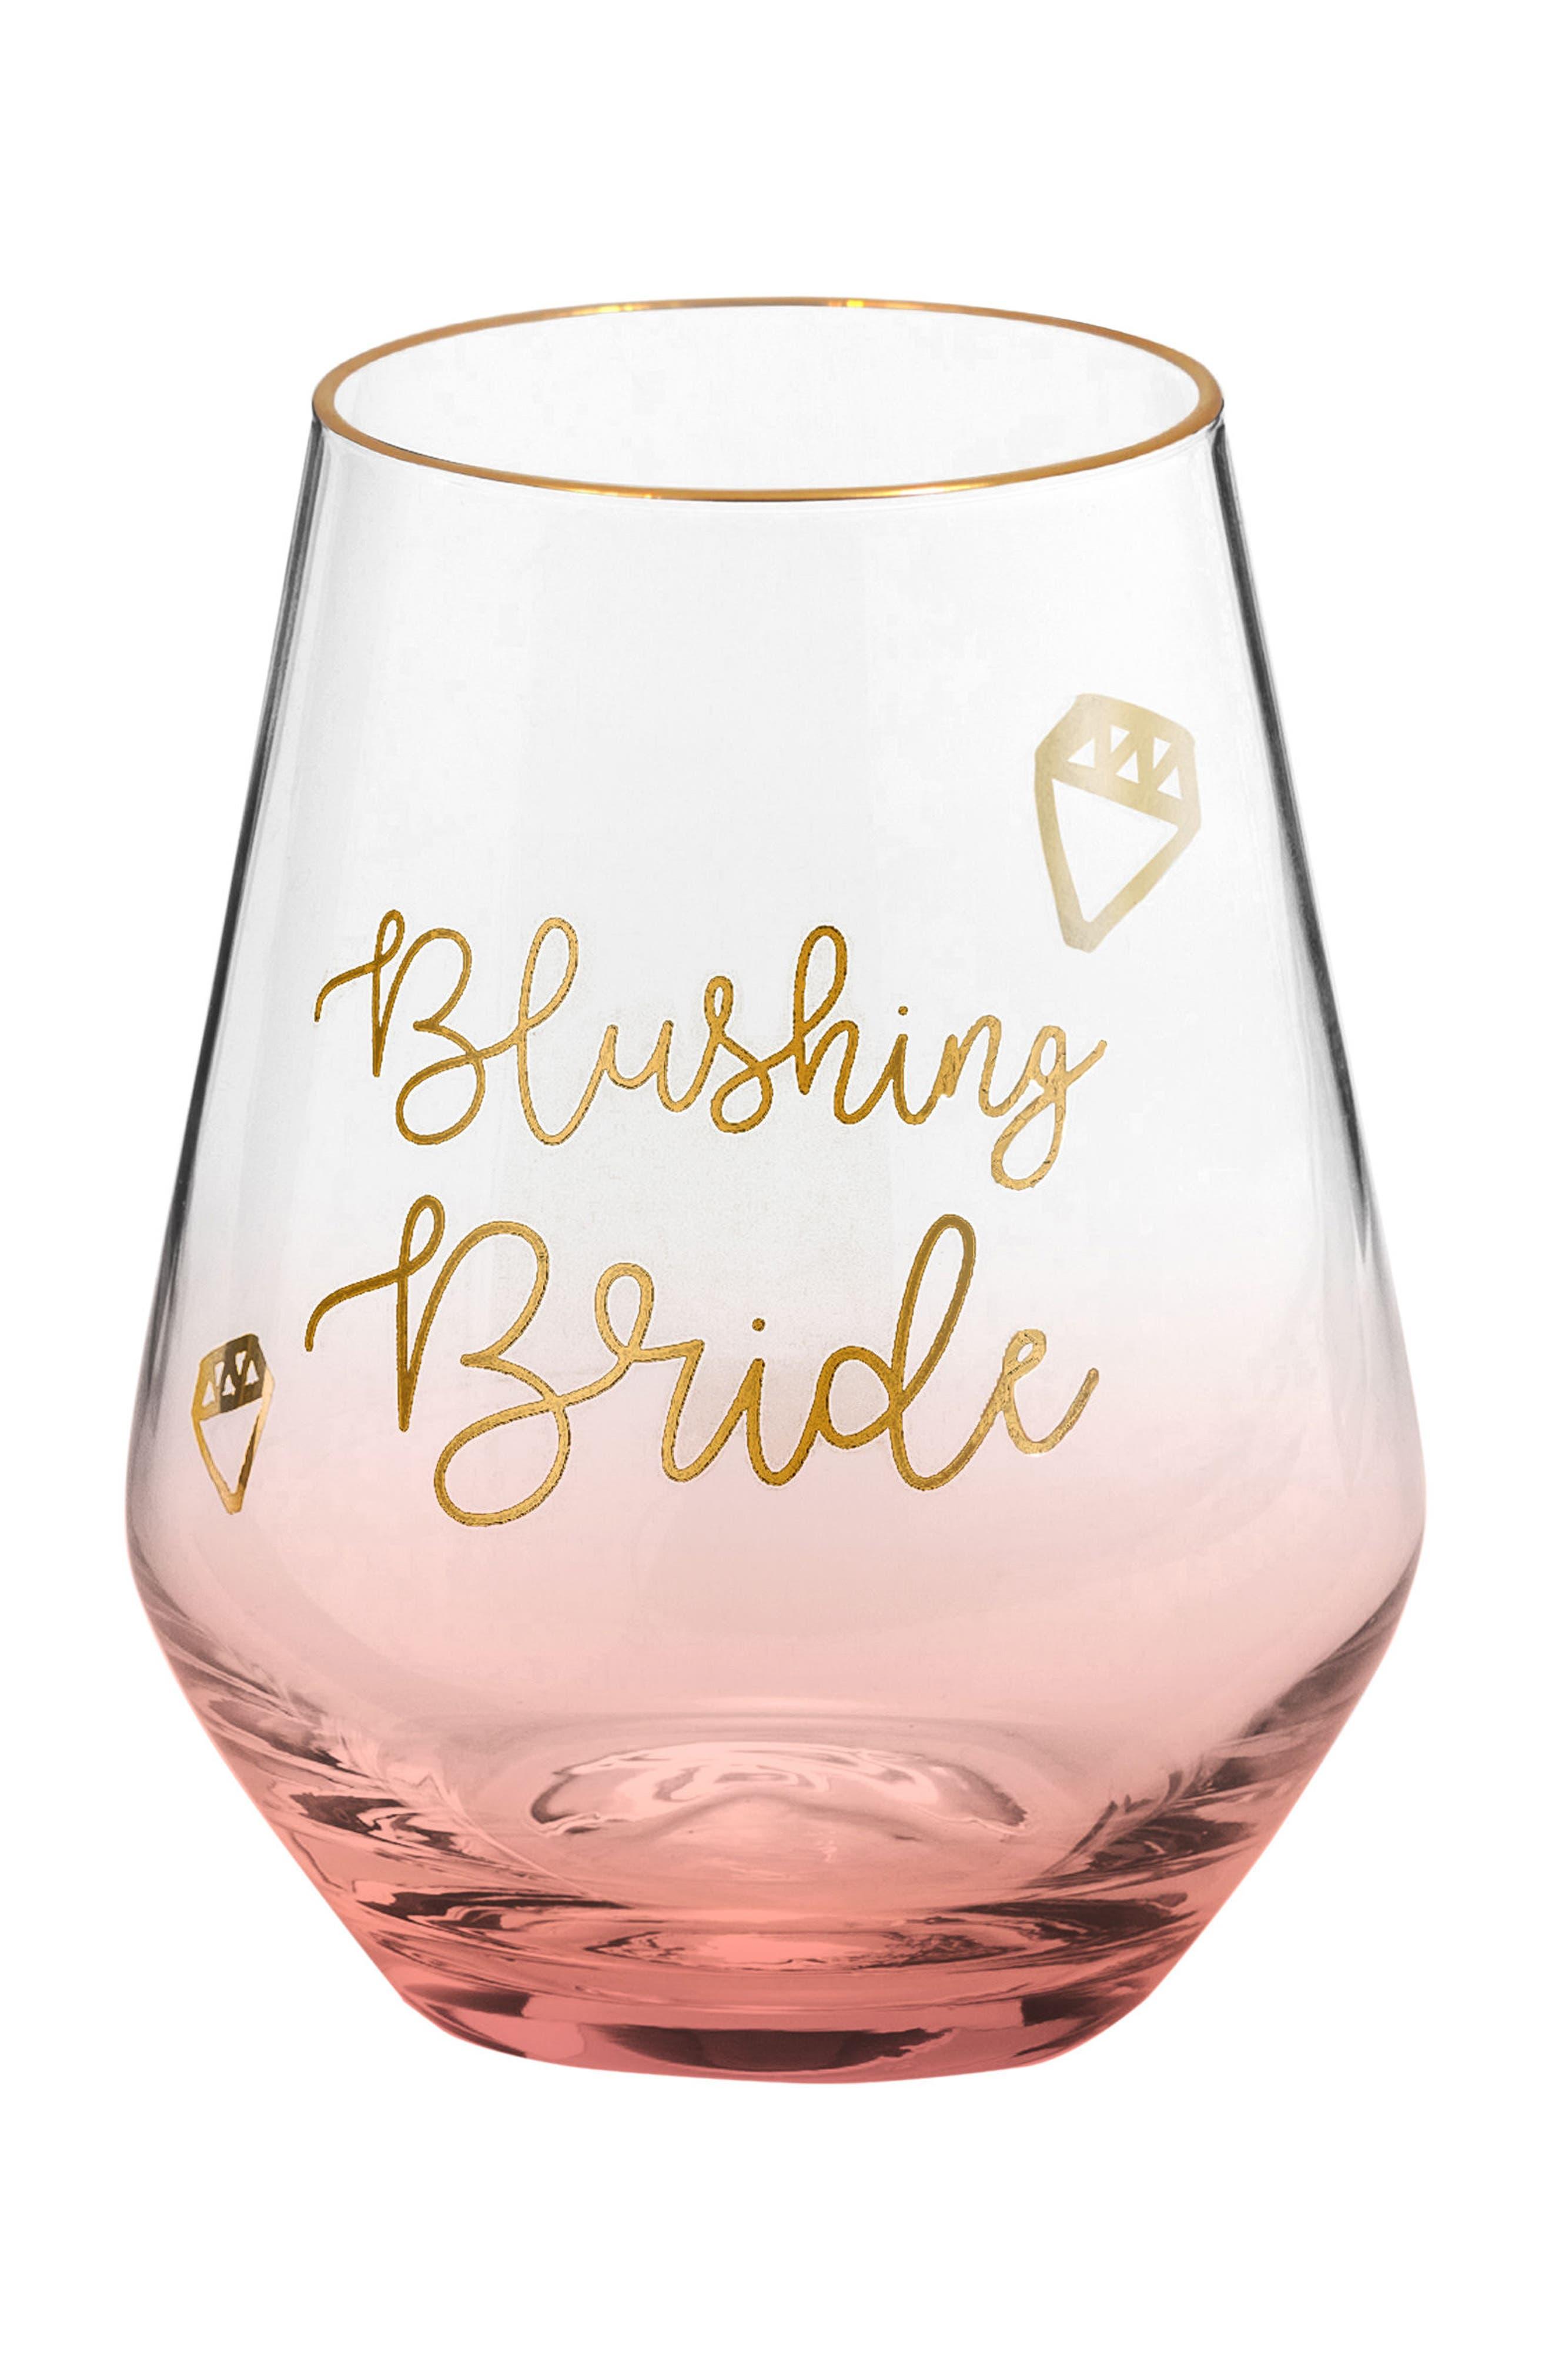 Rosanna Blushing Bride Stemless Wine Glass